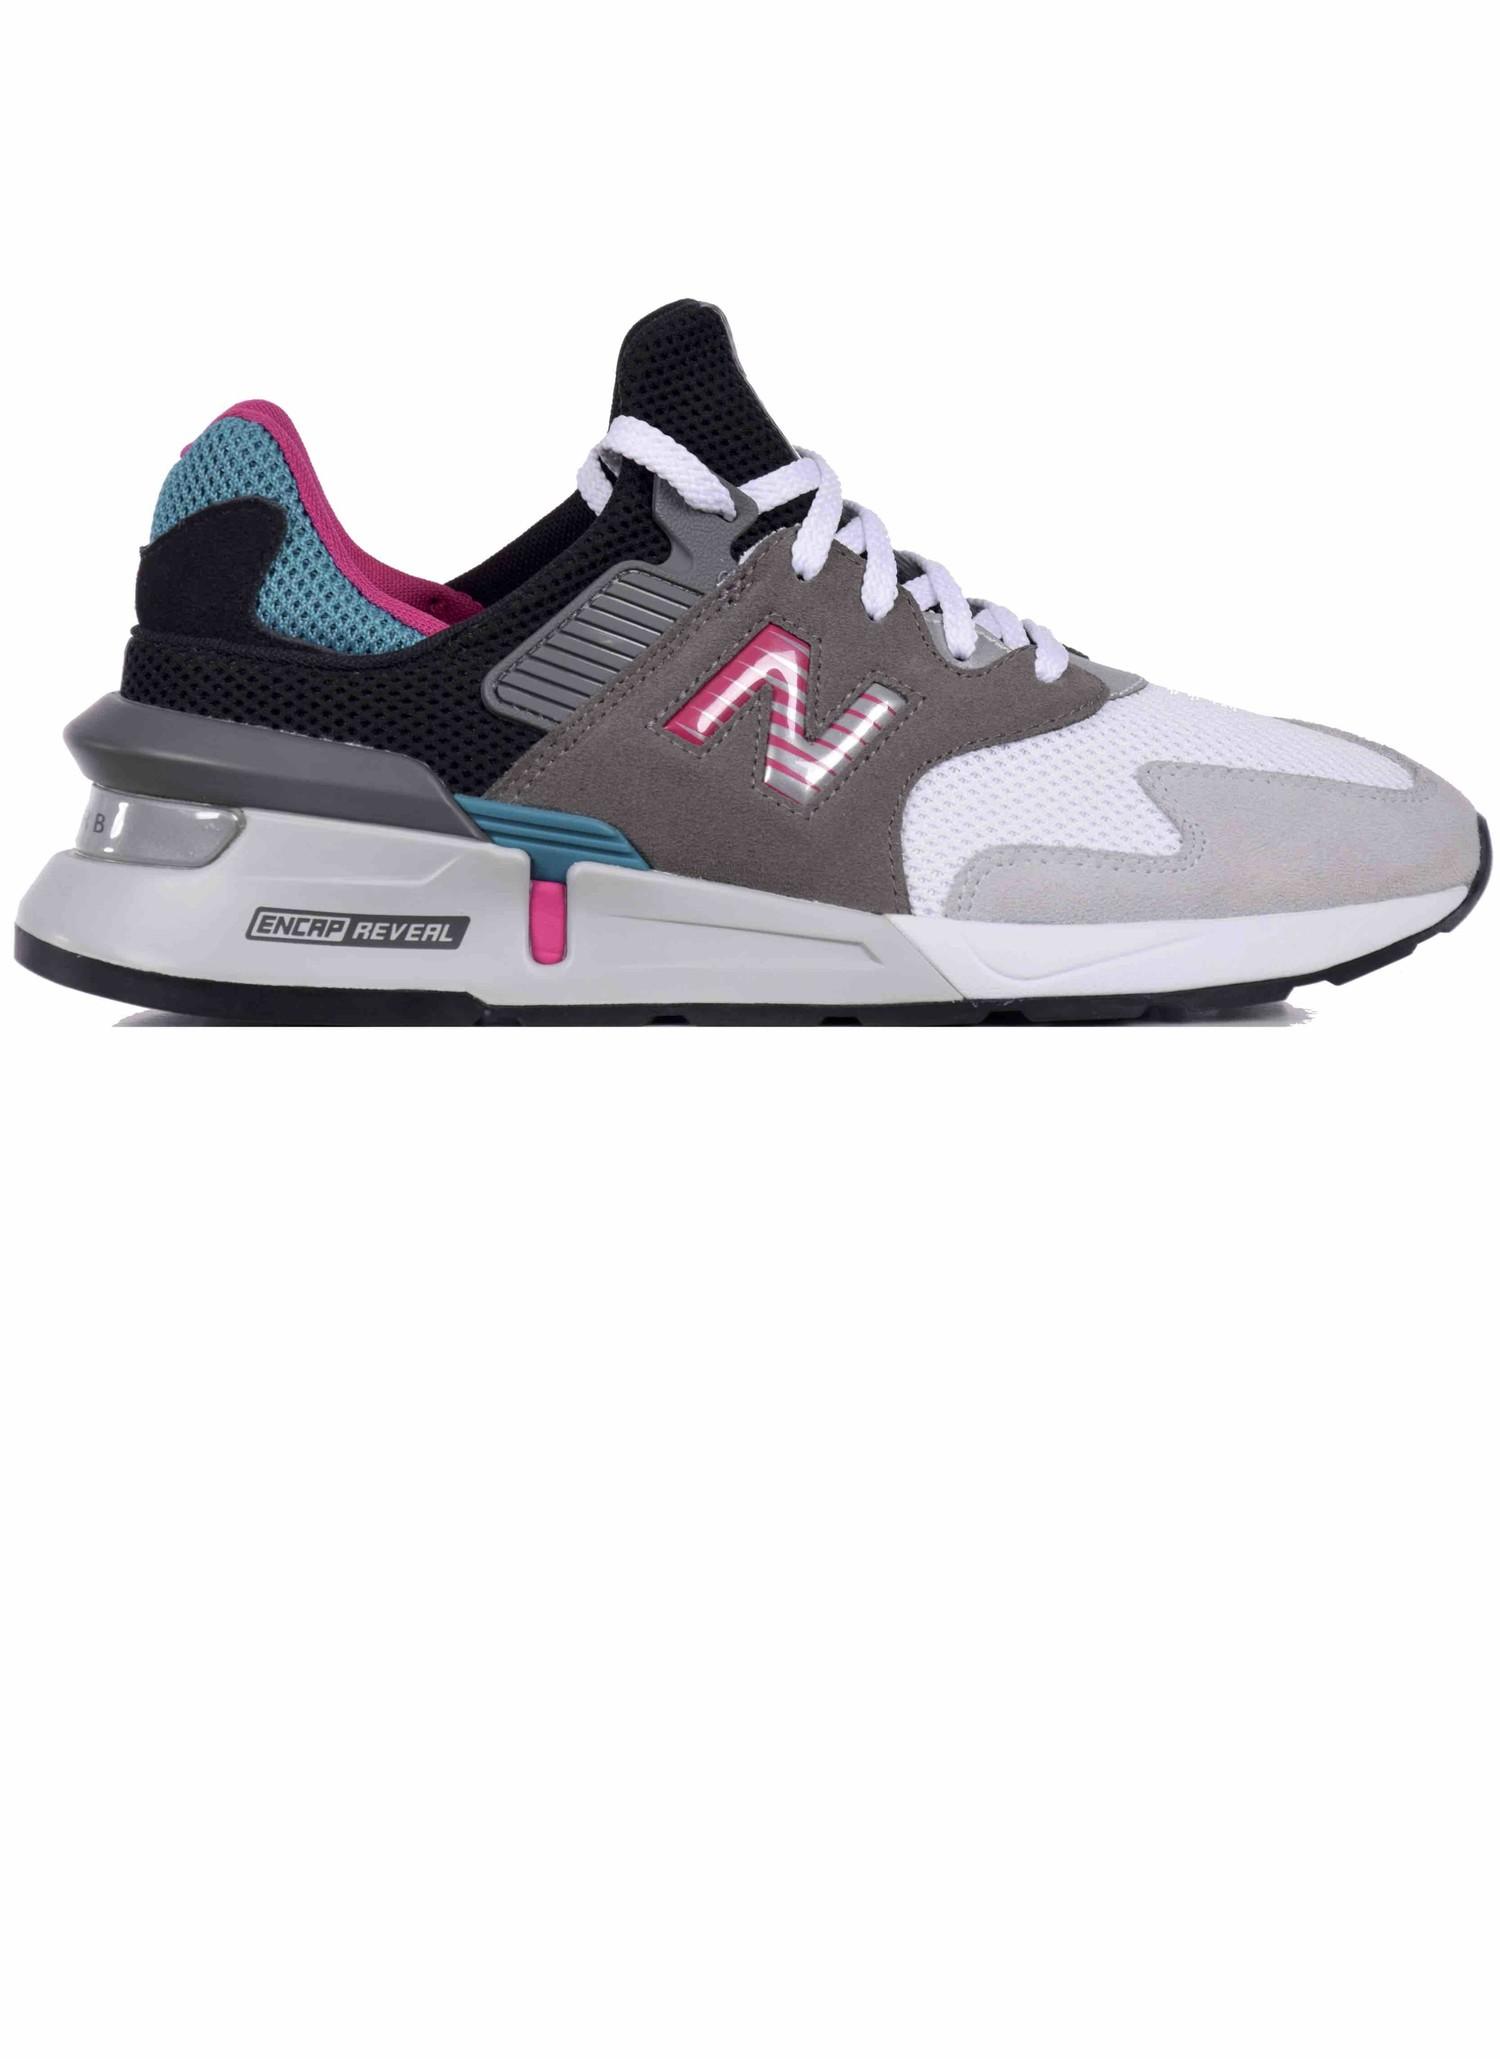 New Balance MS 997 JCF Sneakers Green & Grey   HALO - HALO